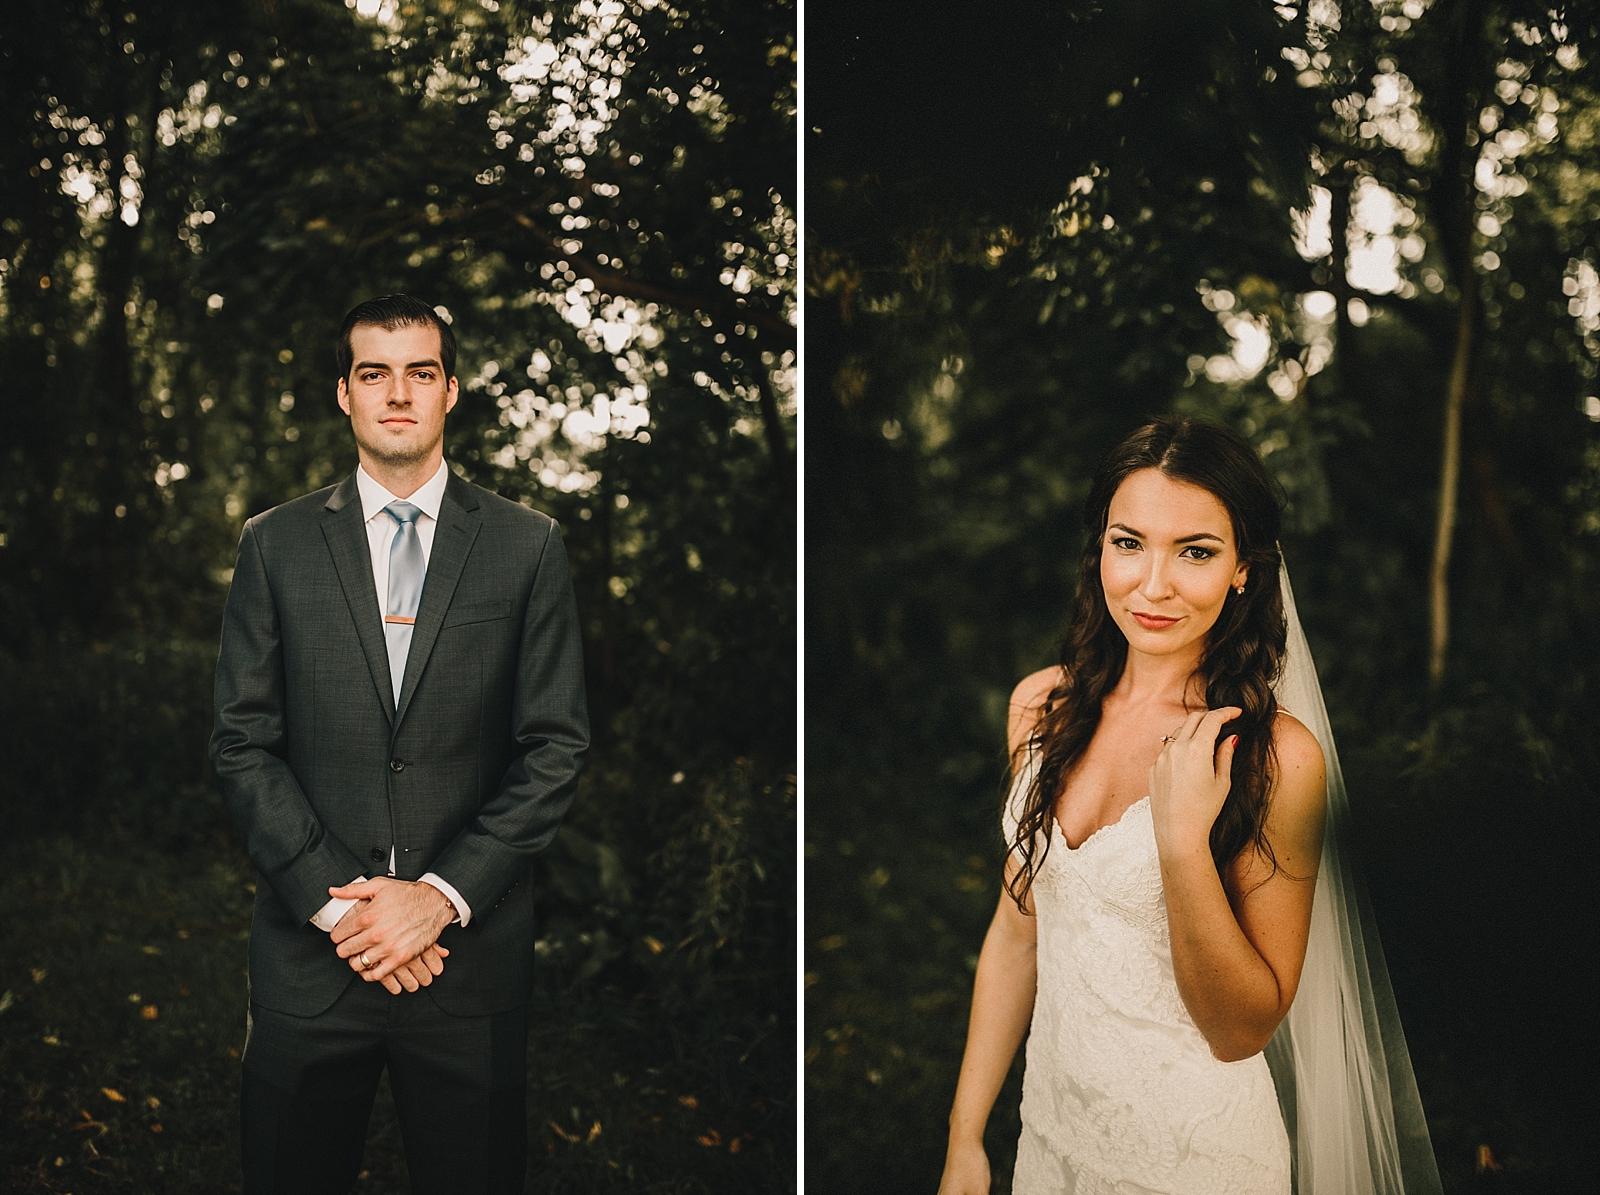 Brielle&Rob-TanaHelenePhotography-119_WEB.jpg